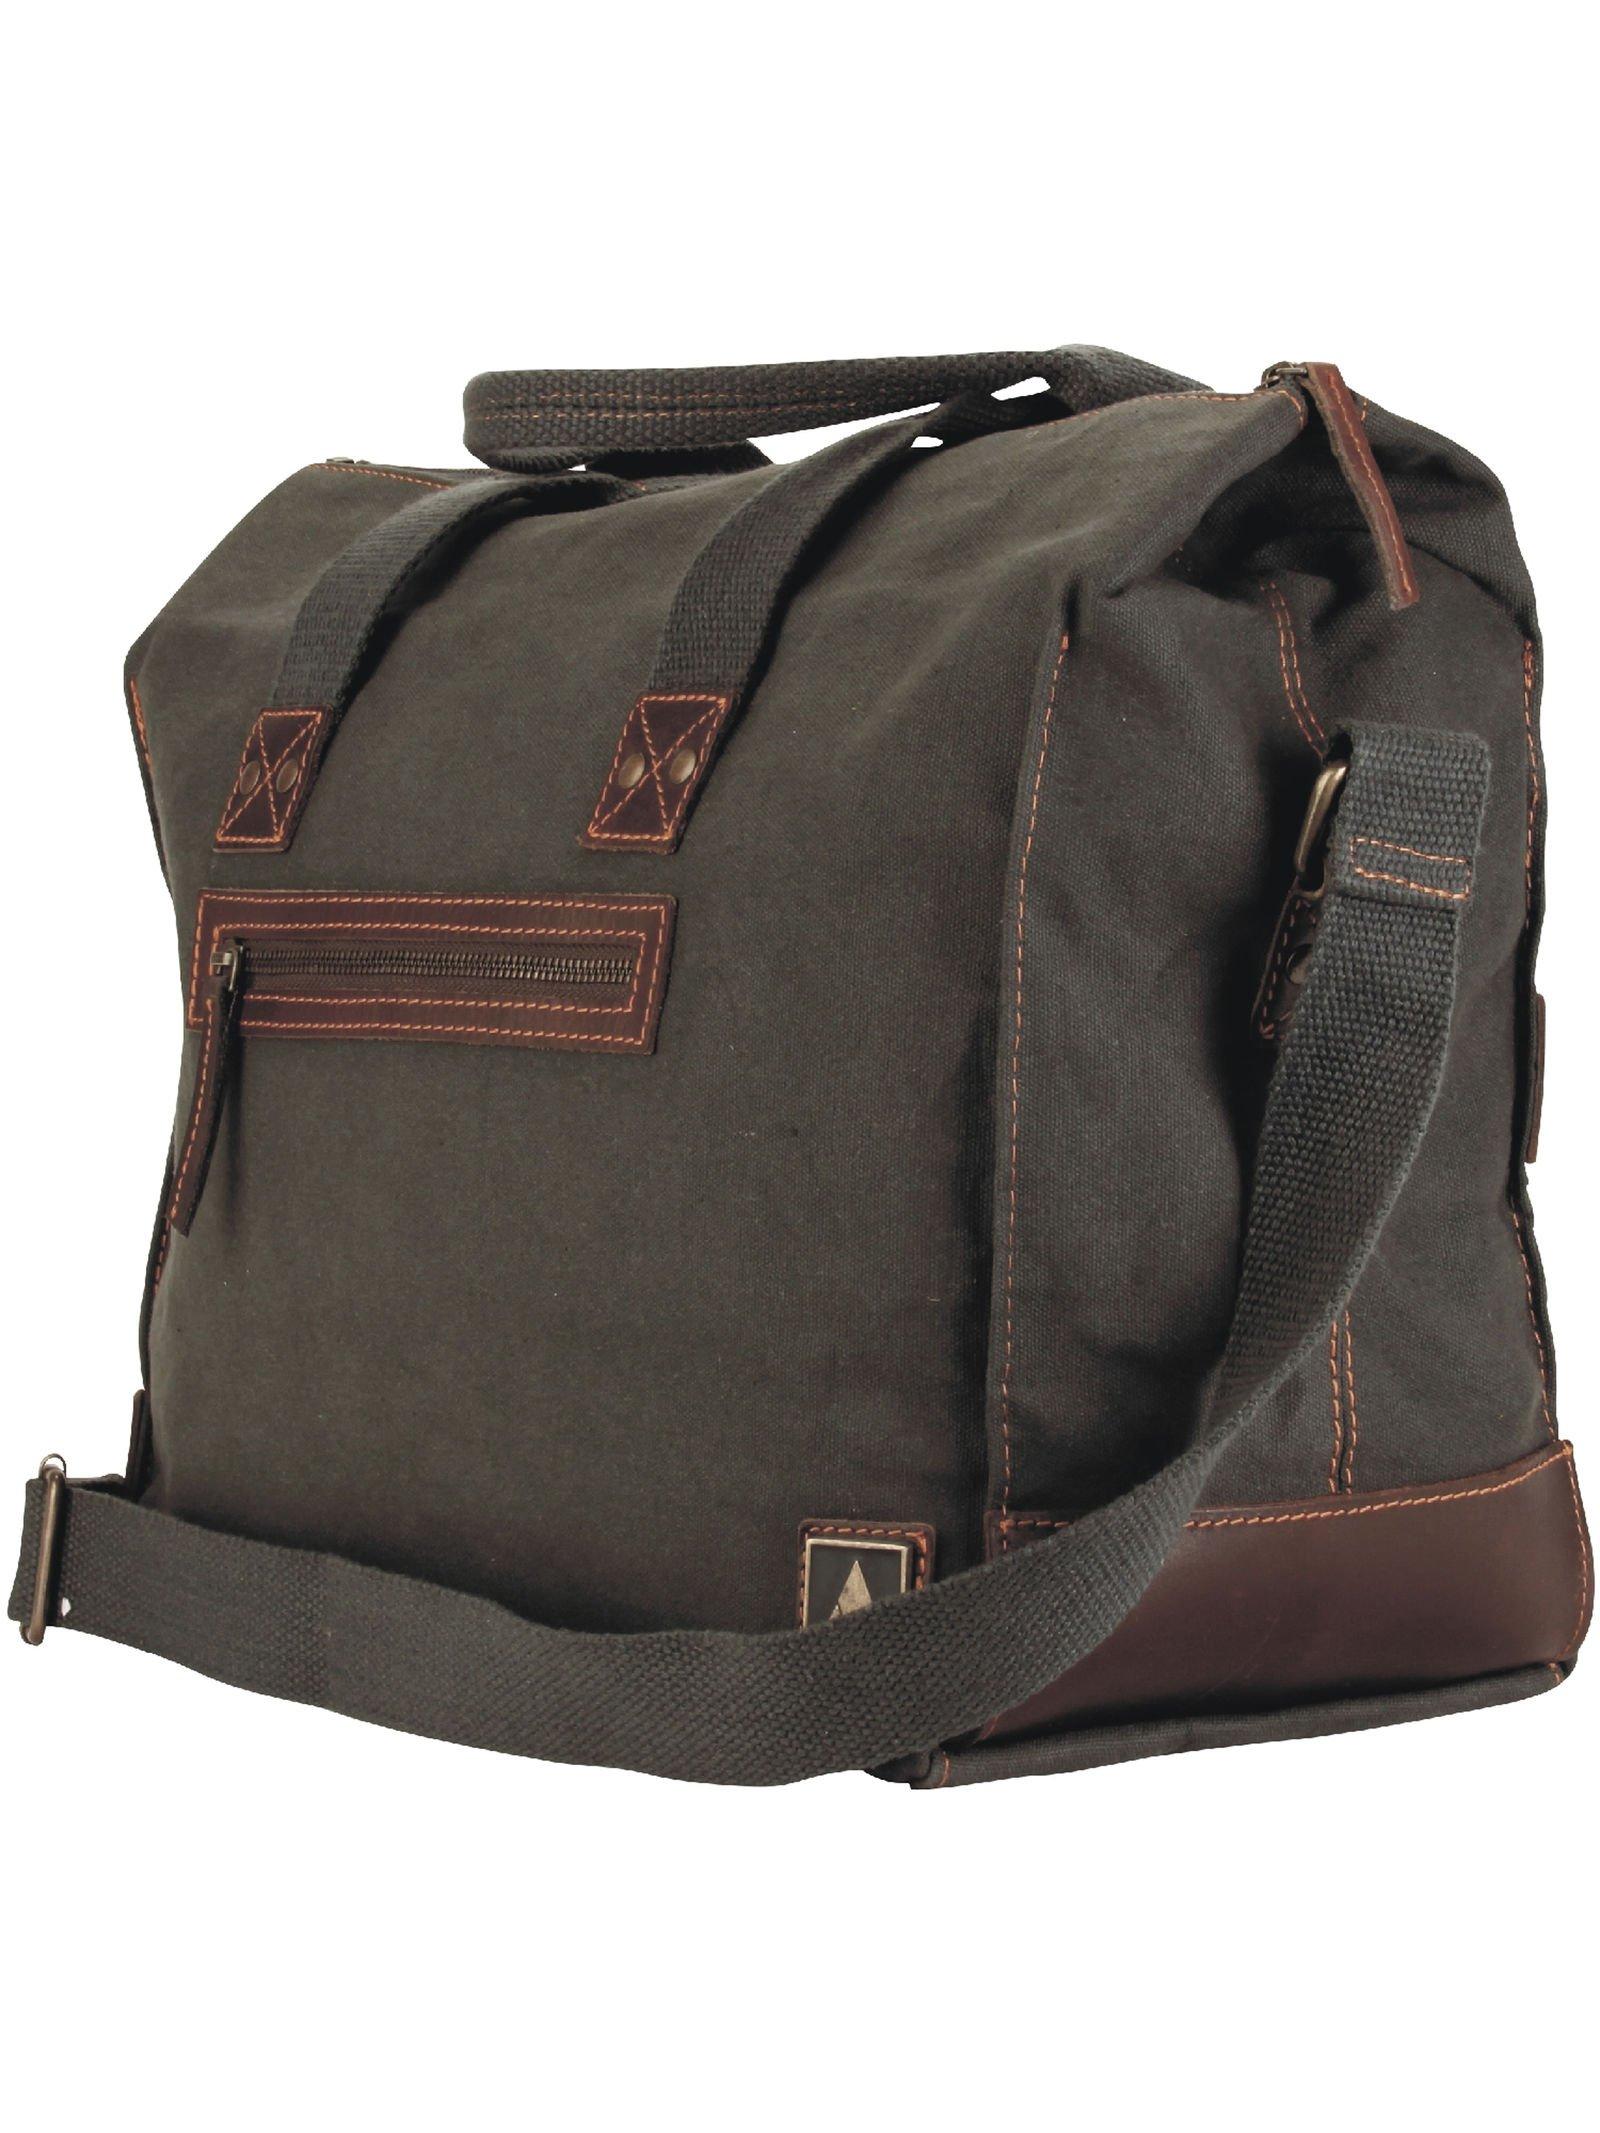 Canvas Satchel Carry-On Bag